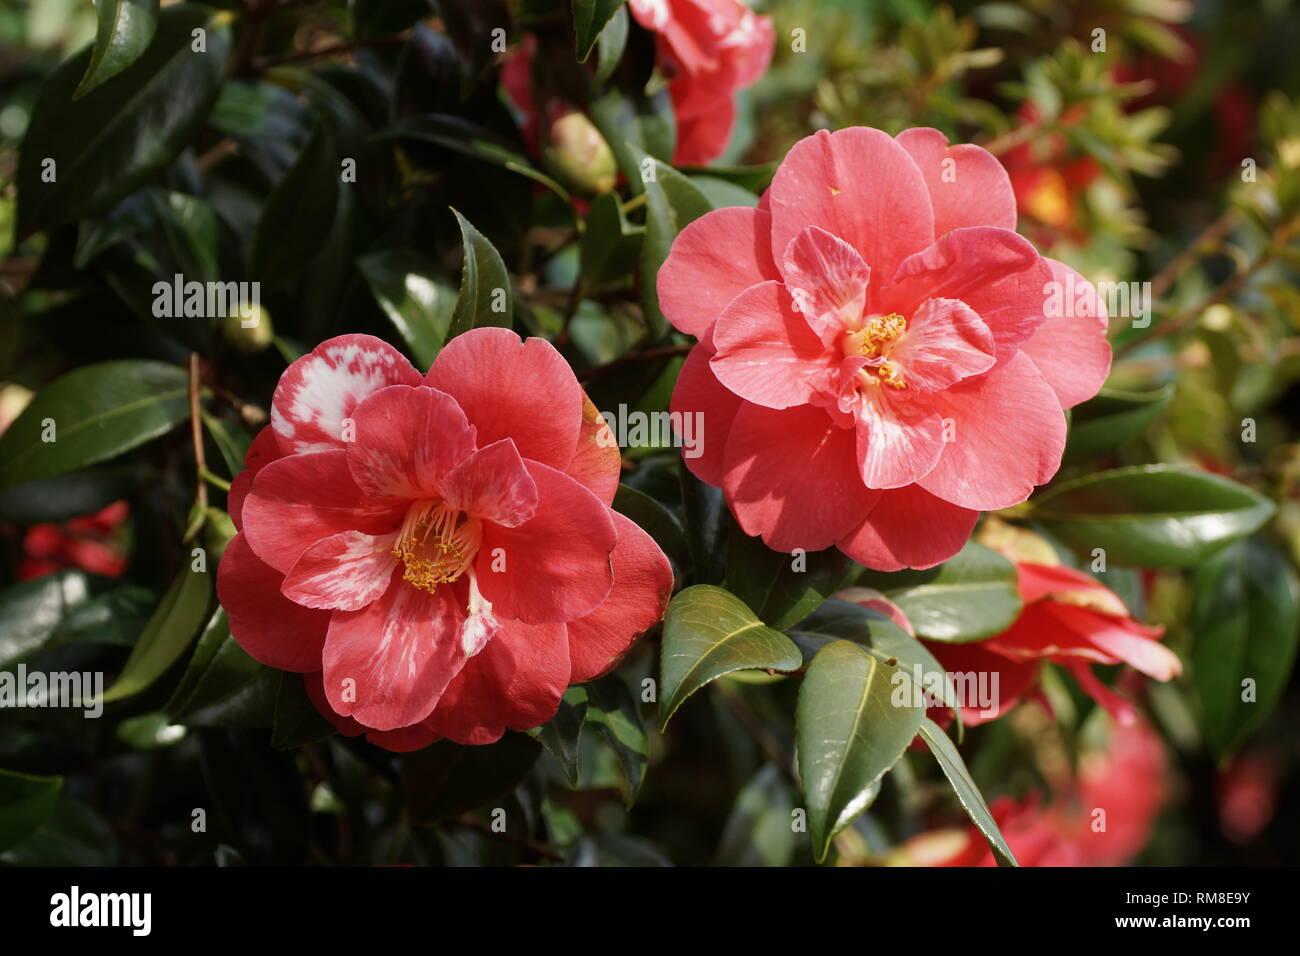 Camellia Japonica Roger Hall cultivar camellia japonica stock photos & cultivar camellia